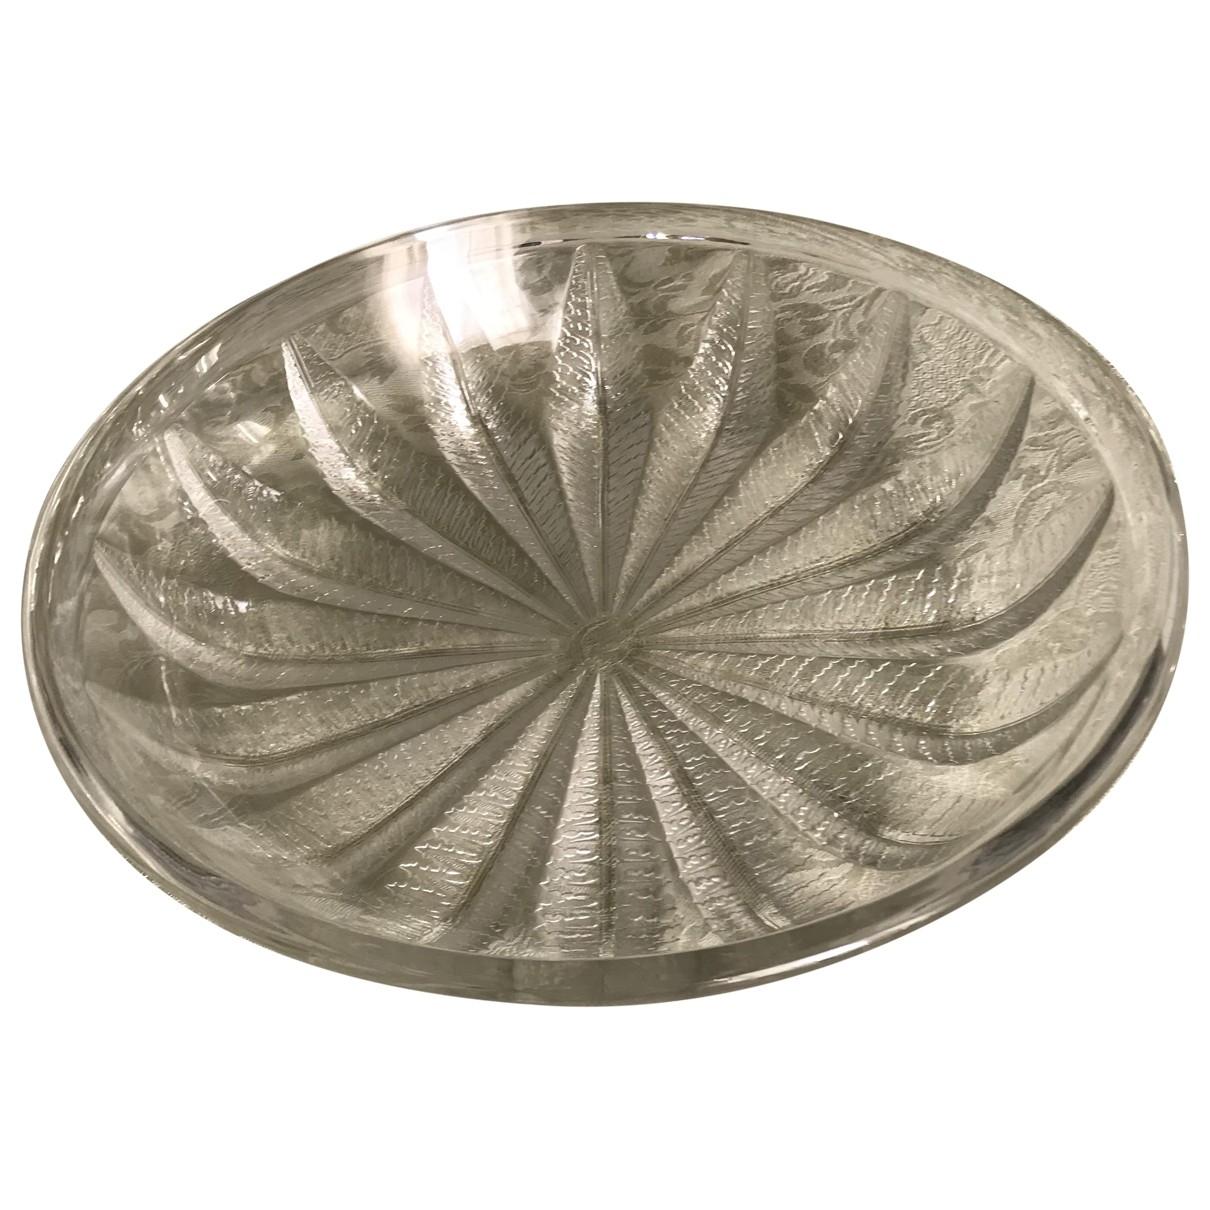 Lalique \N Tischkultur in  Weiss Kristall